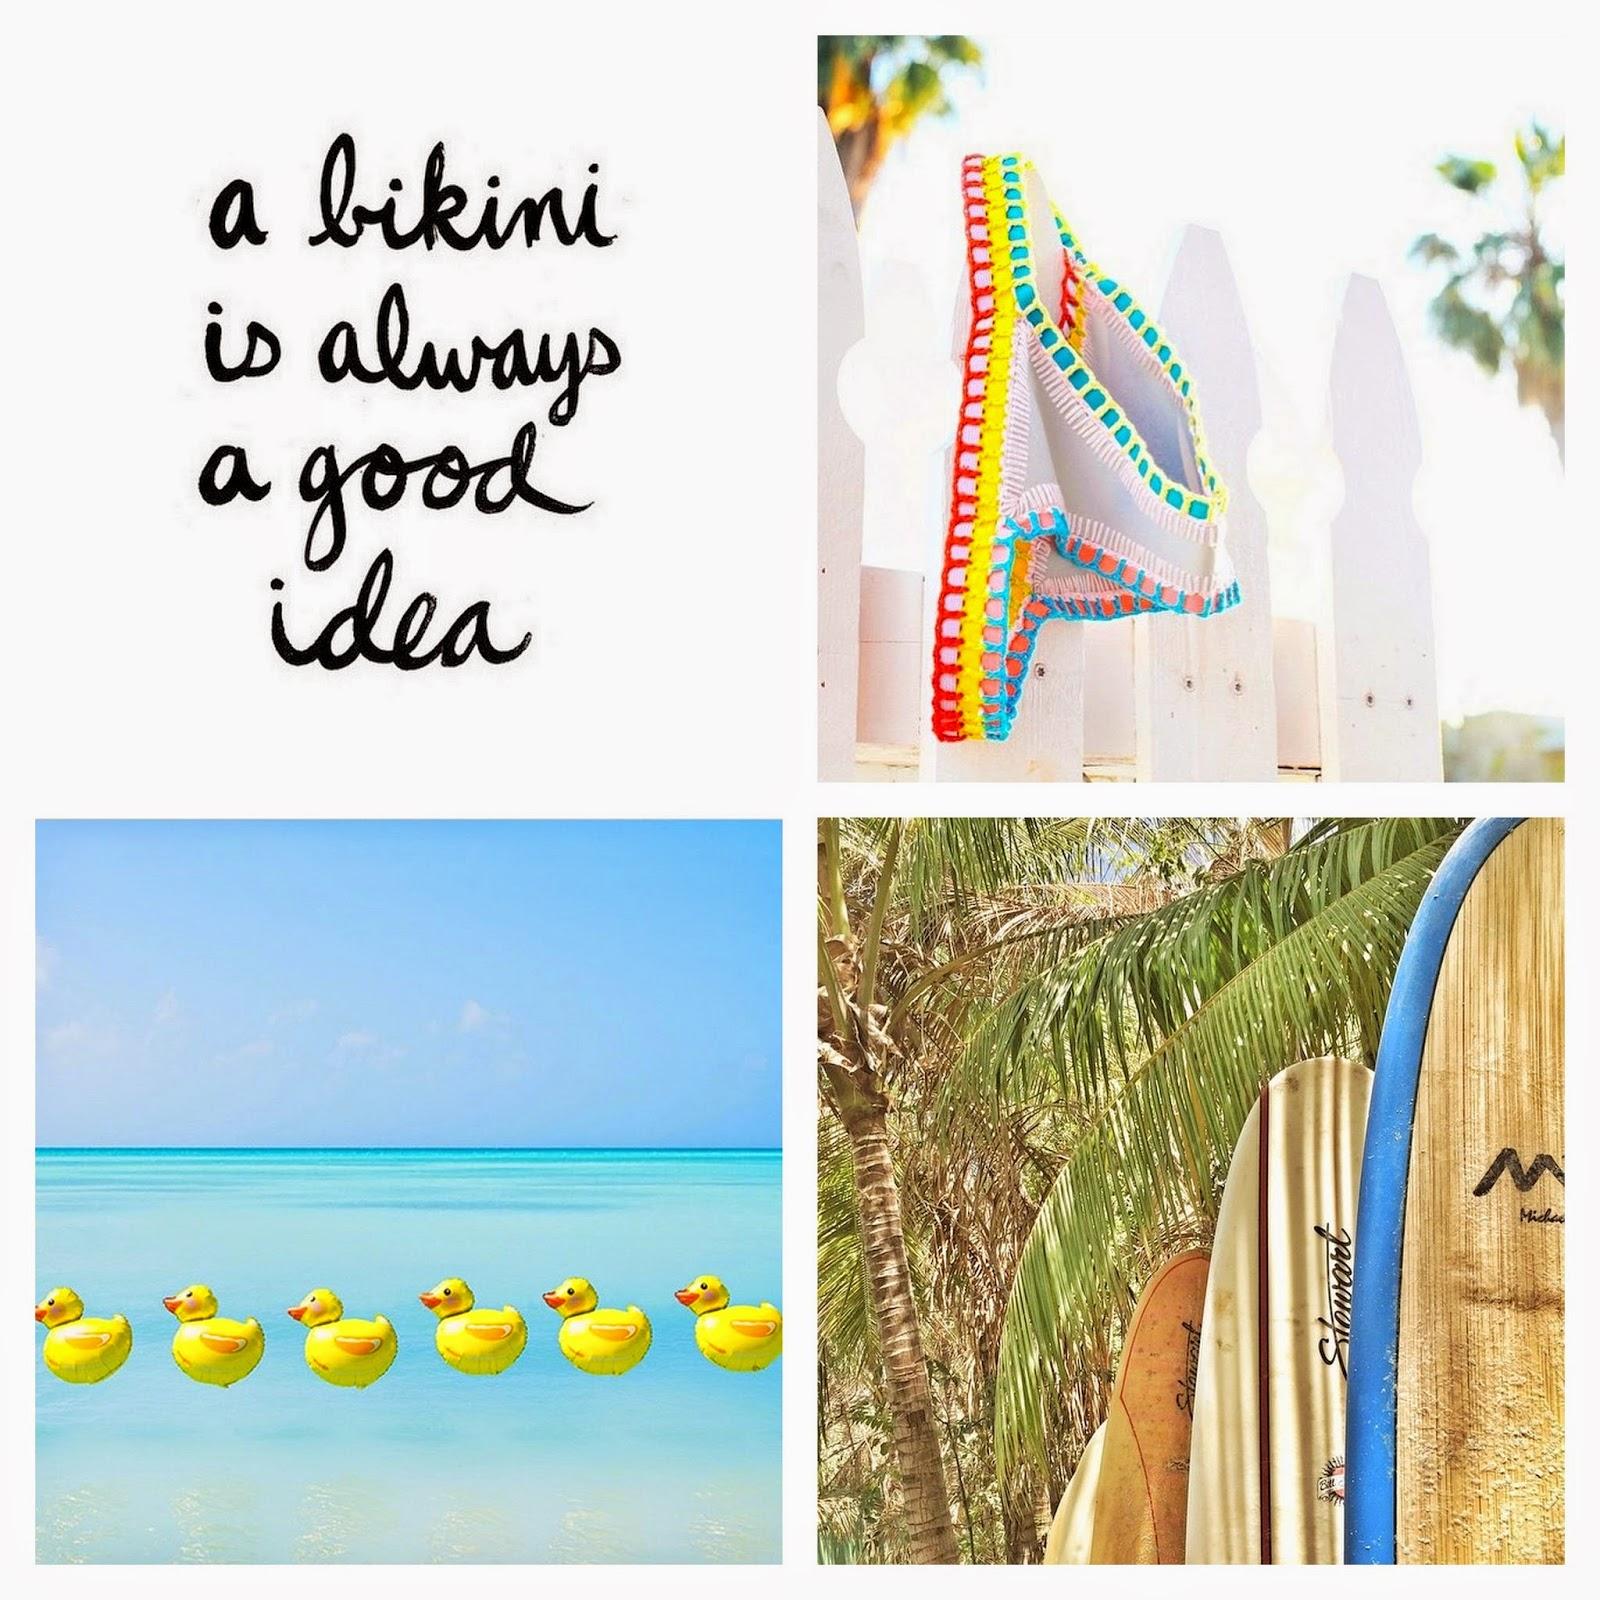 instaove,instagram,the mood,bikinis